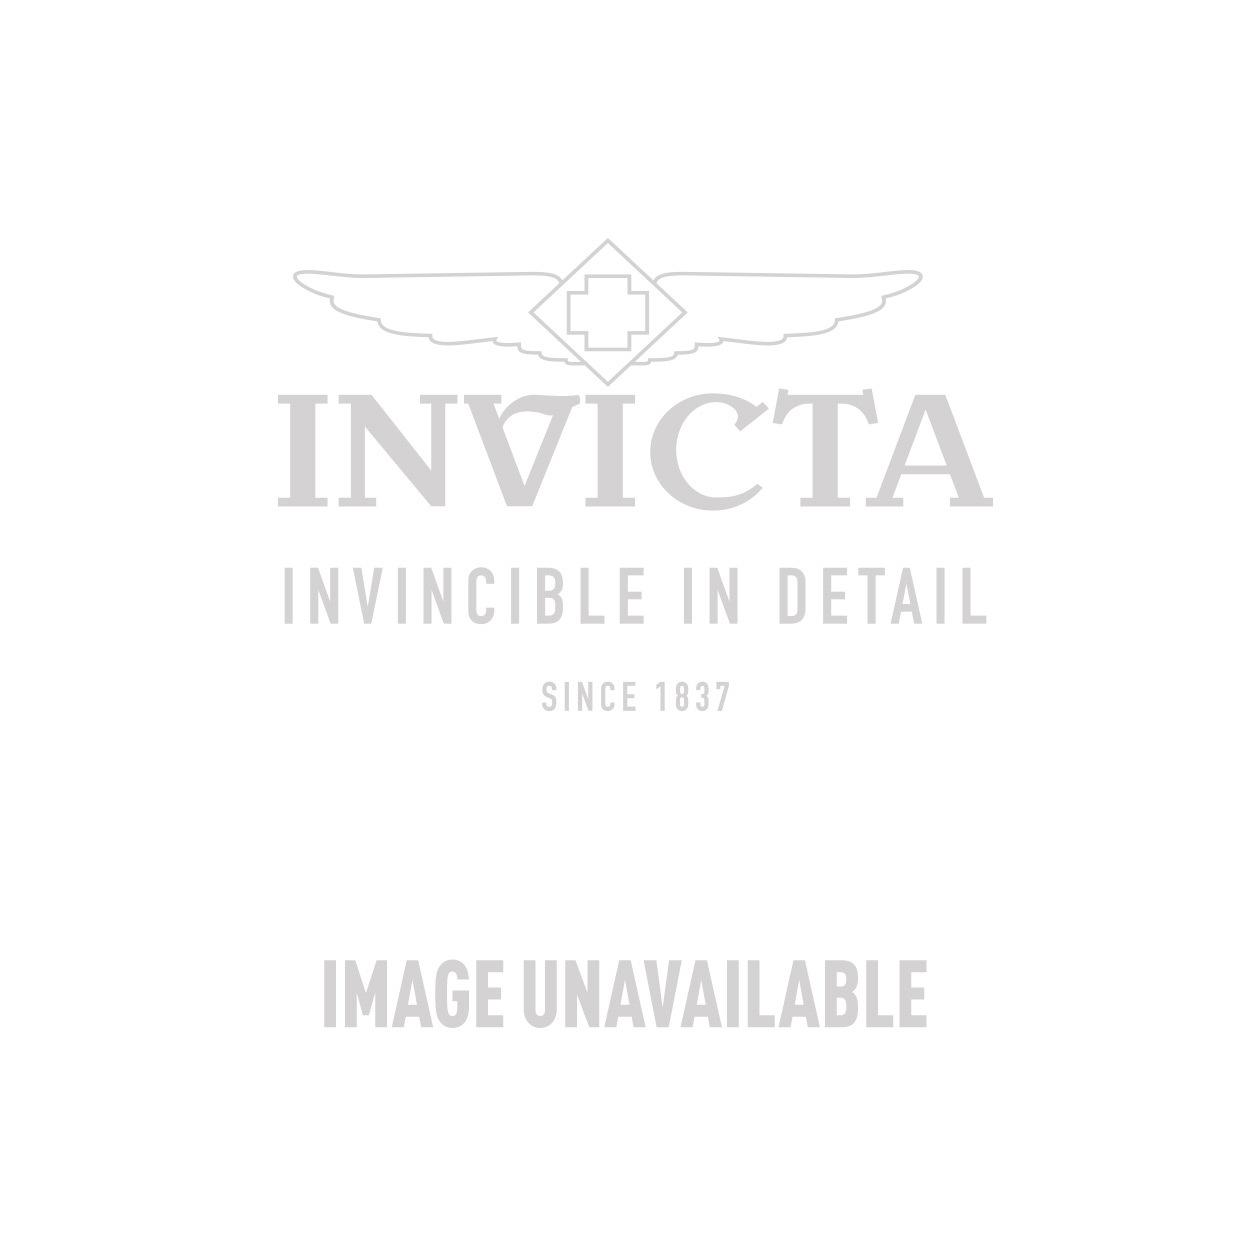 Invicta S1 Rally Quartz Watch - Rose Gold, Black case with Black tone Polyurethane band - Model 17387